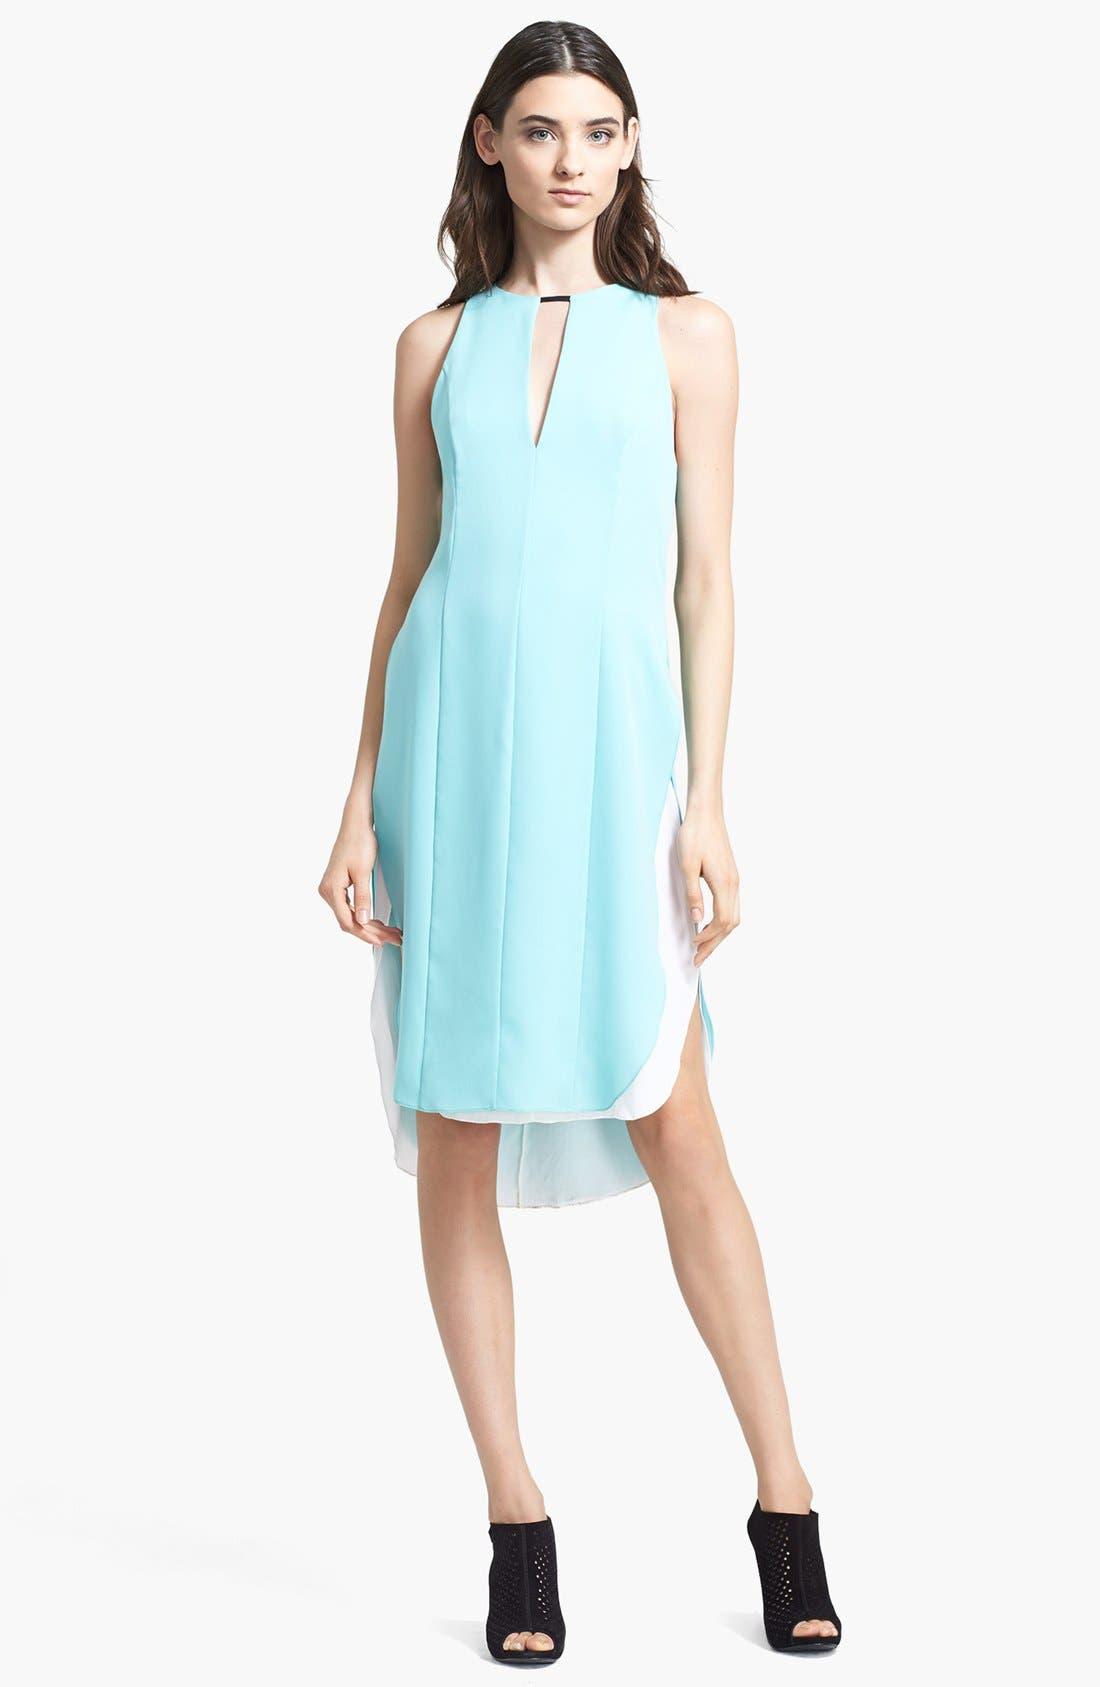 Main Image - rag & bone 'Alyna' High/Low Dress